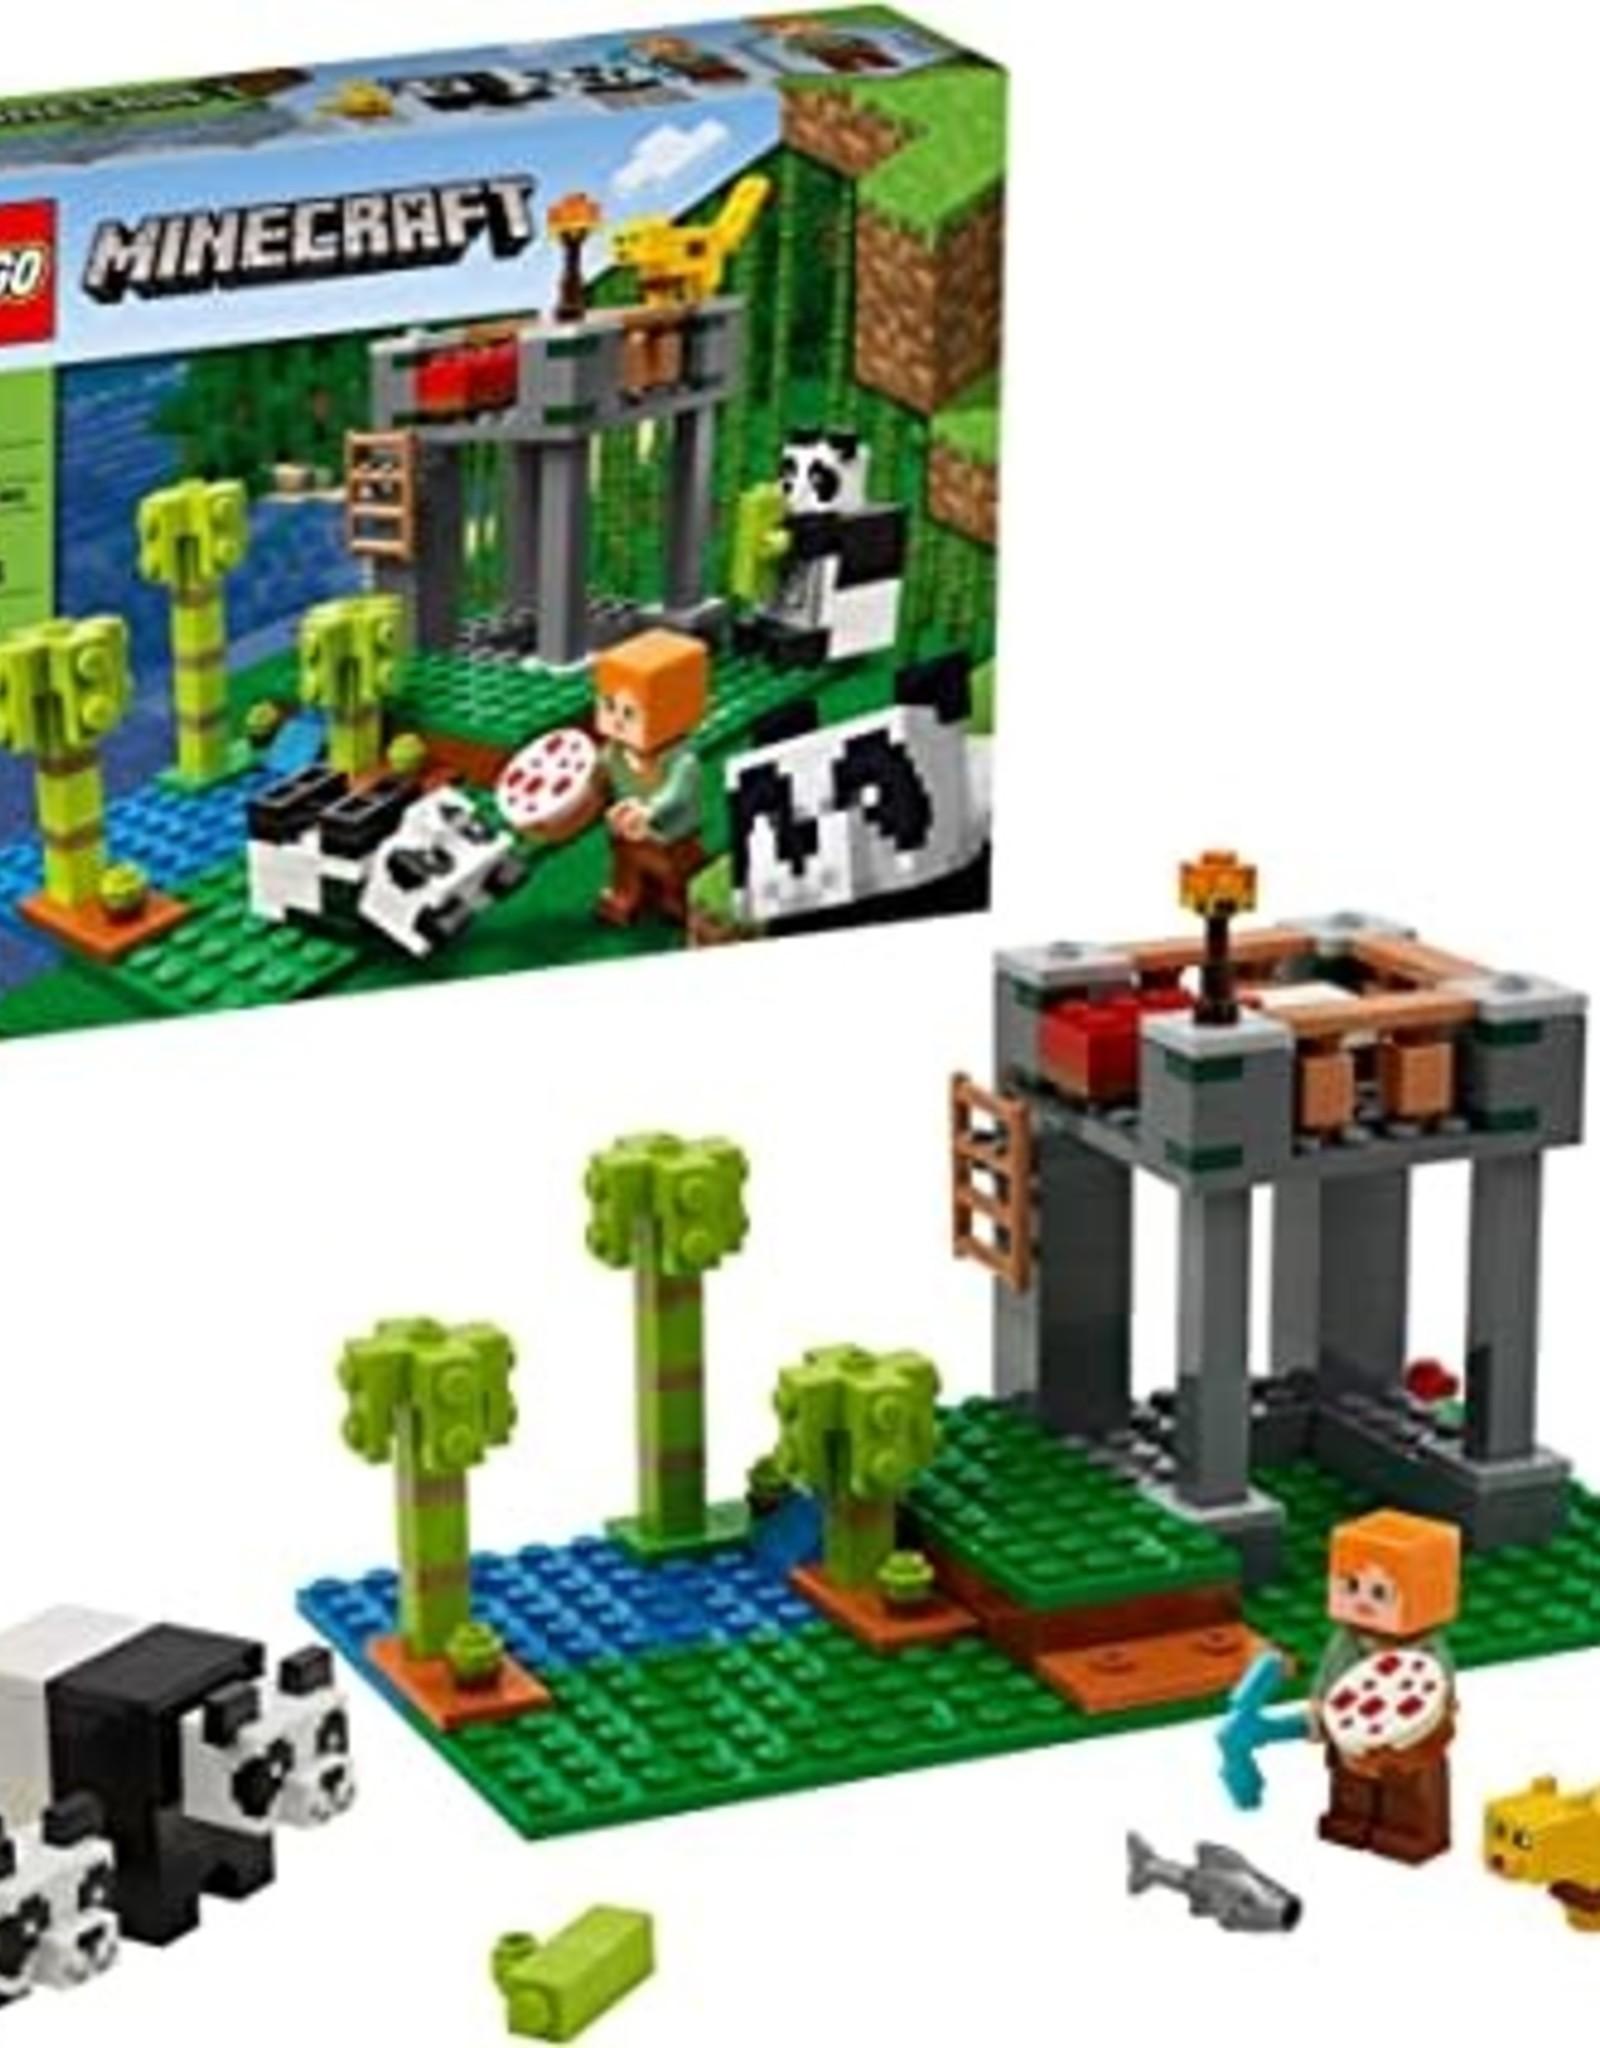 The Panda Nursery lego